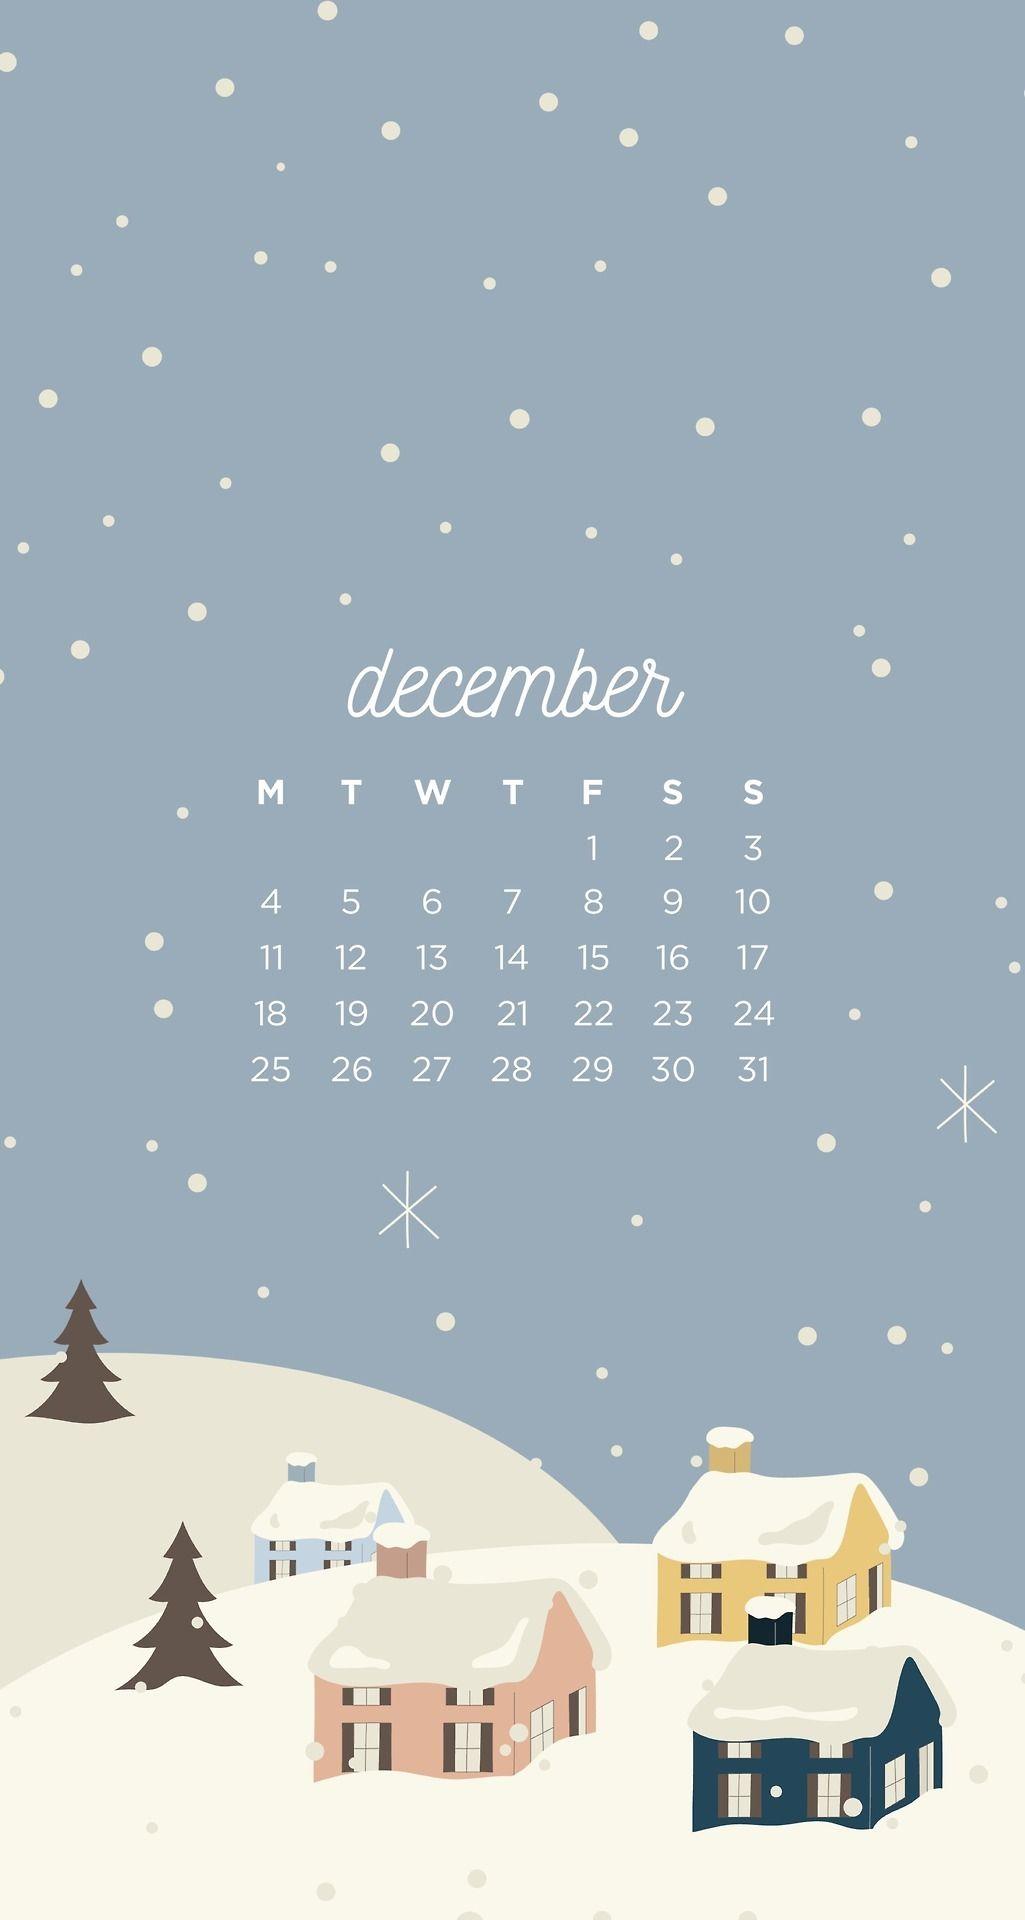 December Phone Calendar Christmas Phone Wallpaper Cute Christmas Wallpaper Wallpaper Iphone Christmas